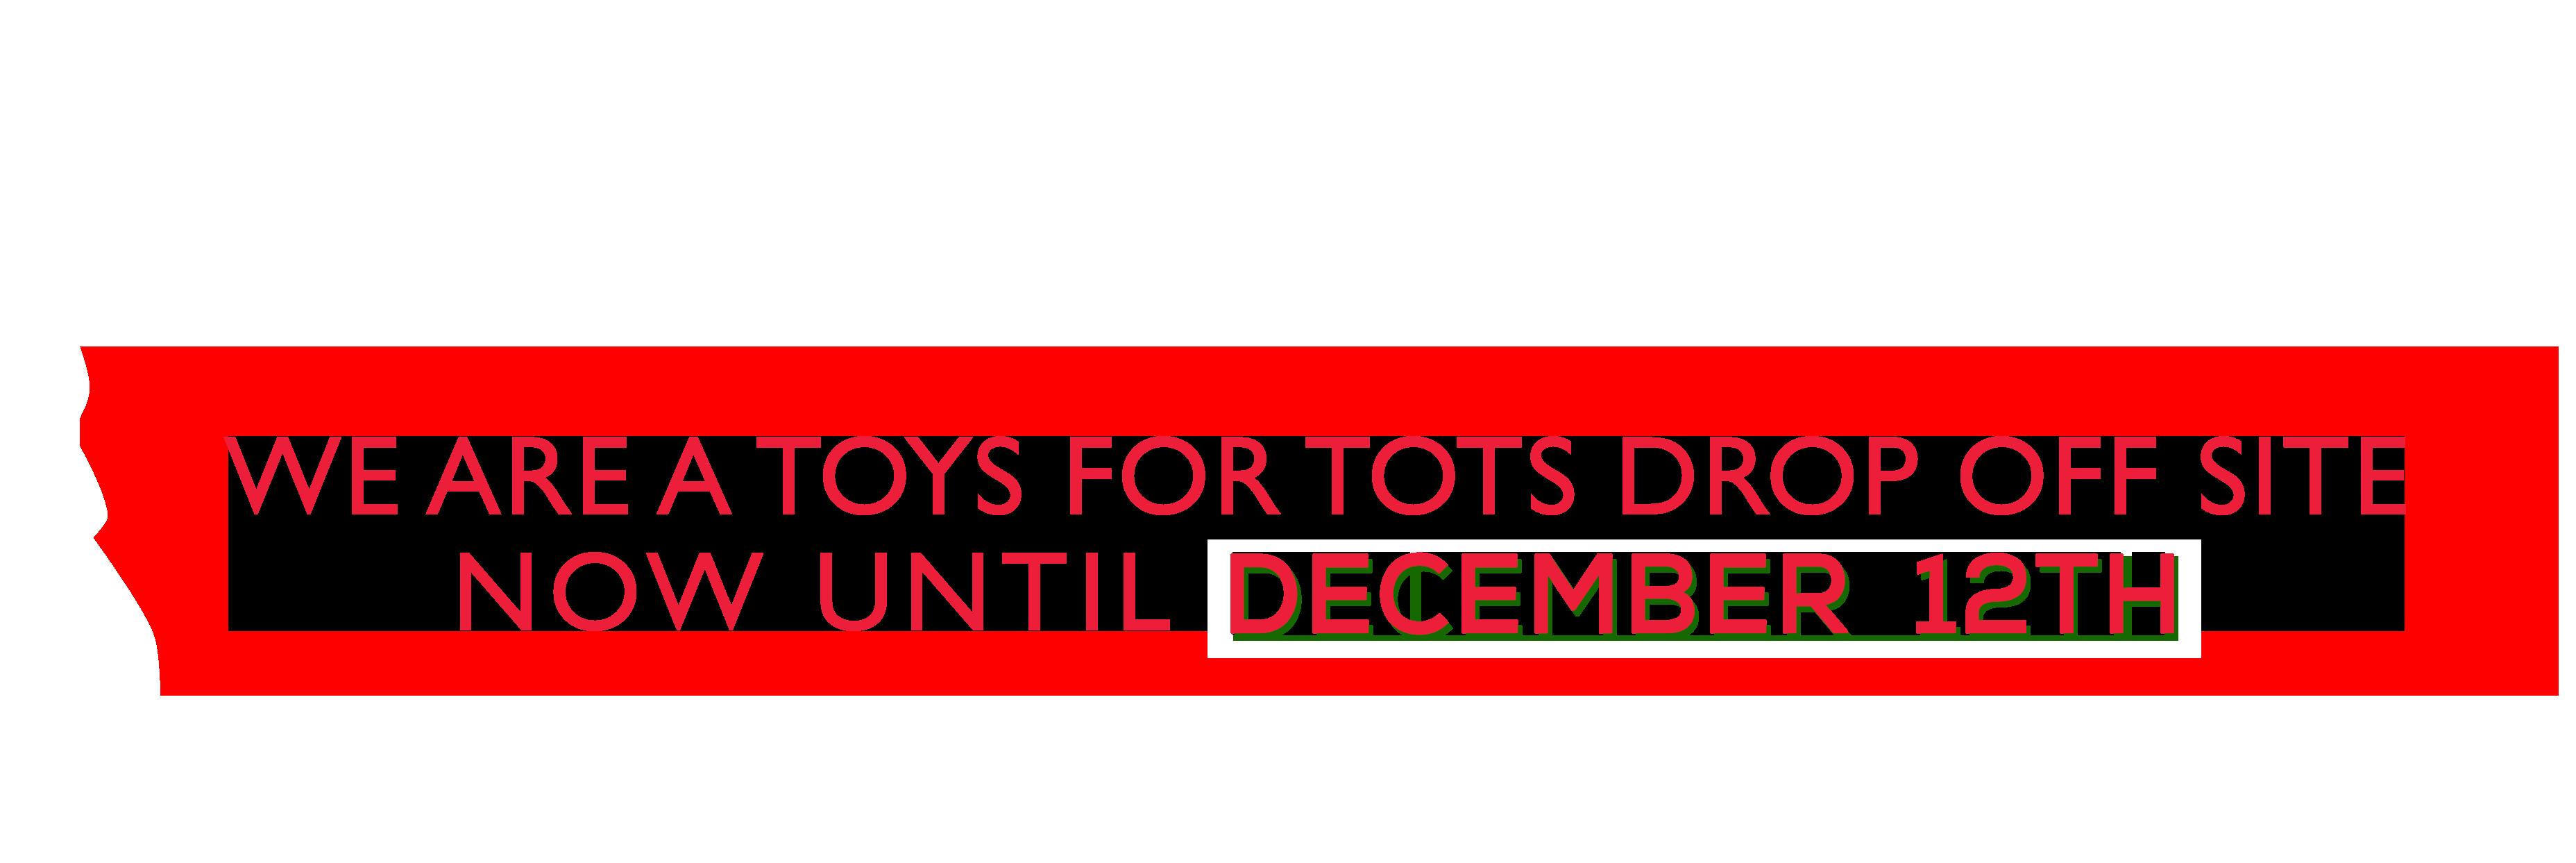 Sidelines_ToysForTots_Poster-toys-logo-tex_2019t.png